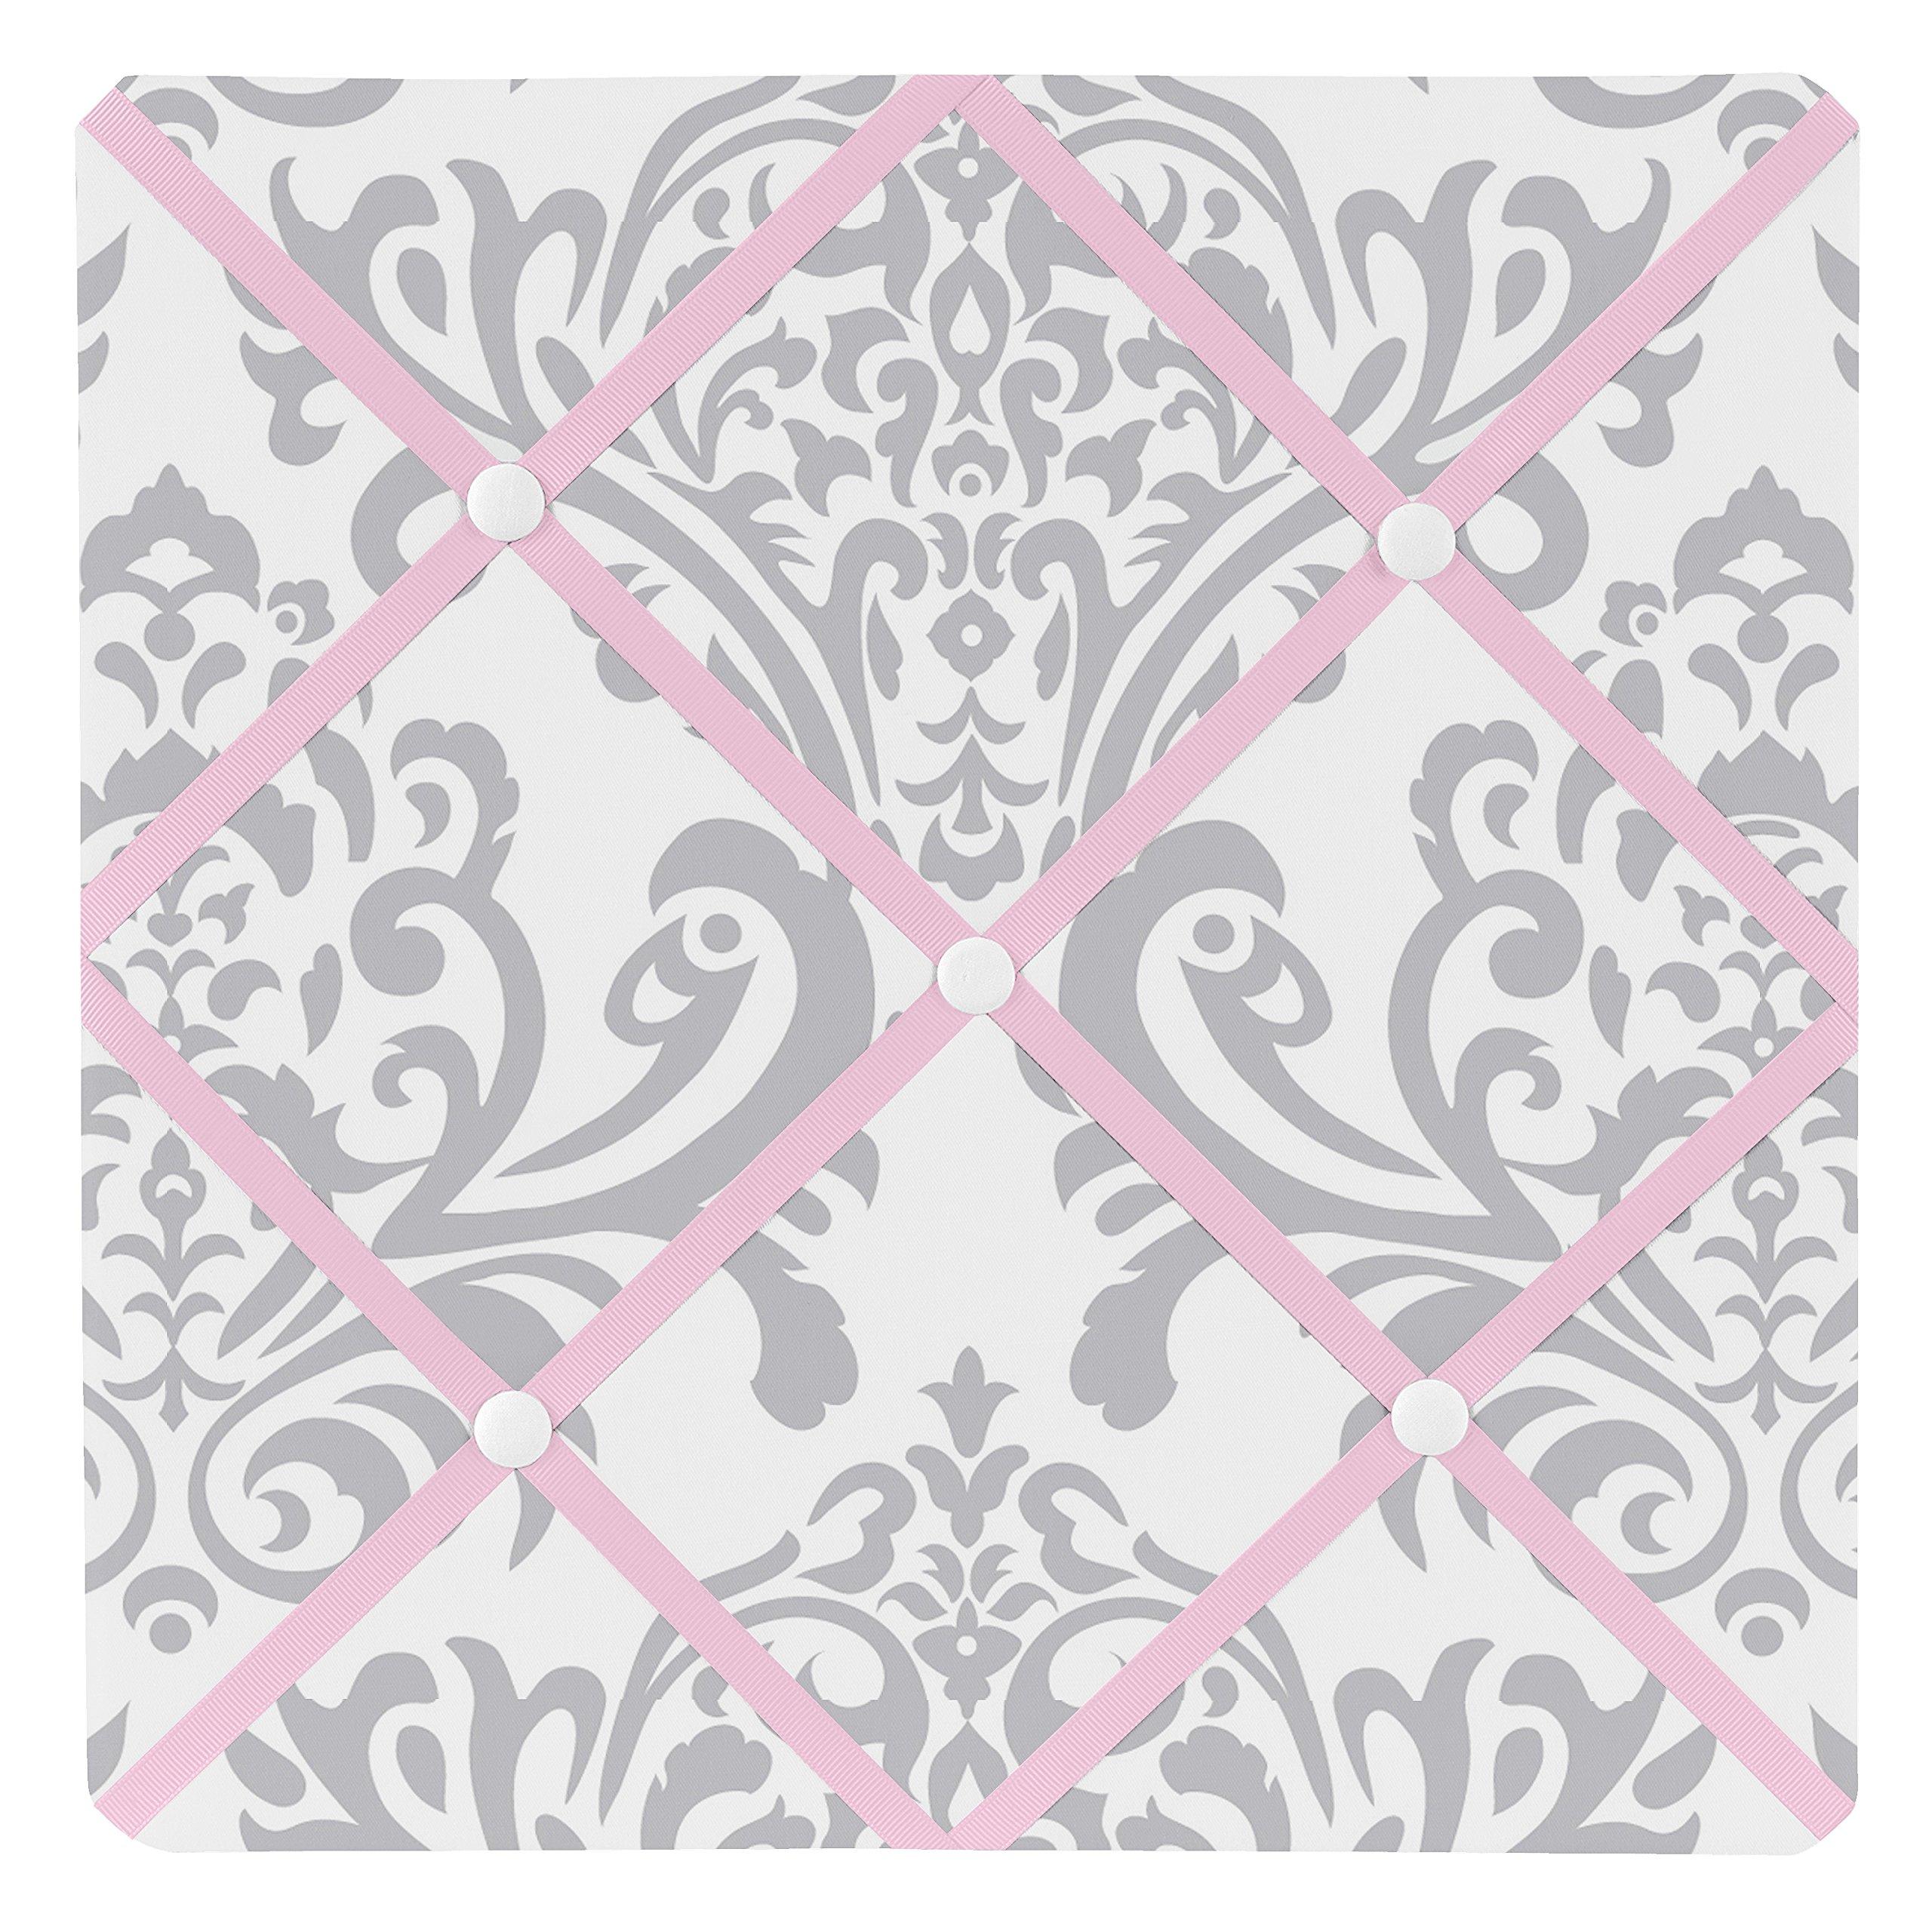 Sweet Jojo Designs Pink, Gray and White Elizabeth Fabric Memory/Memo Photo Bulletin Board by Sweet Jojo Designs